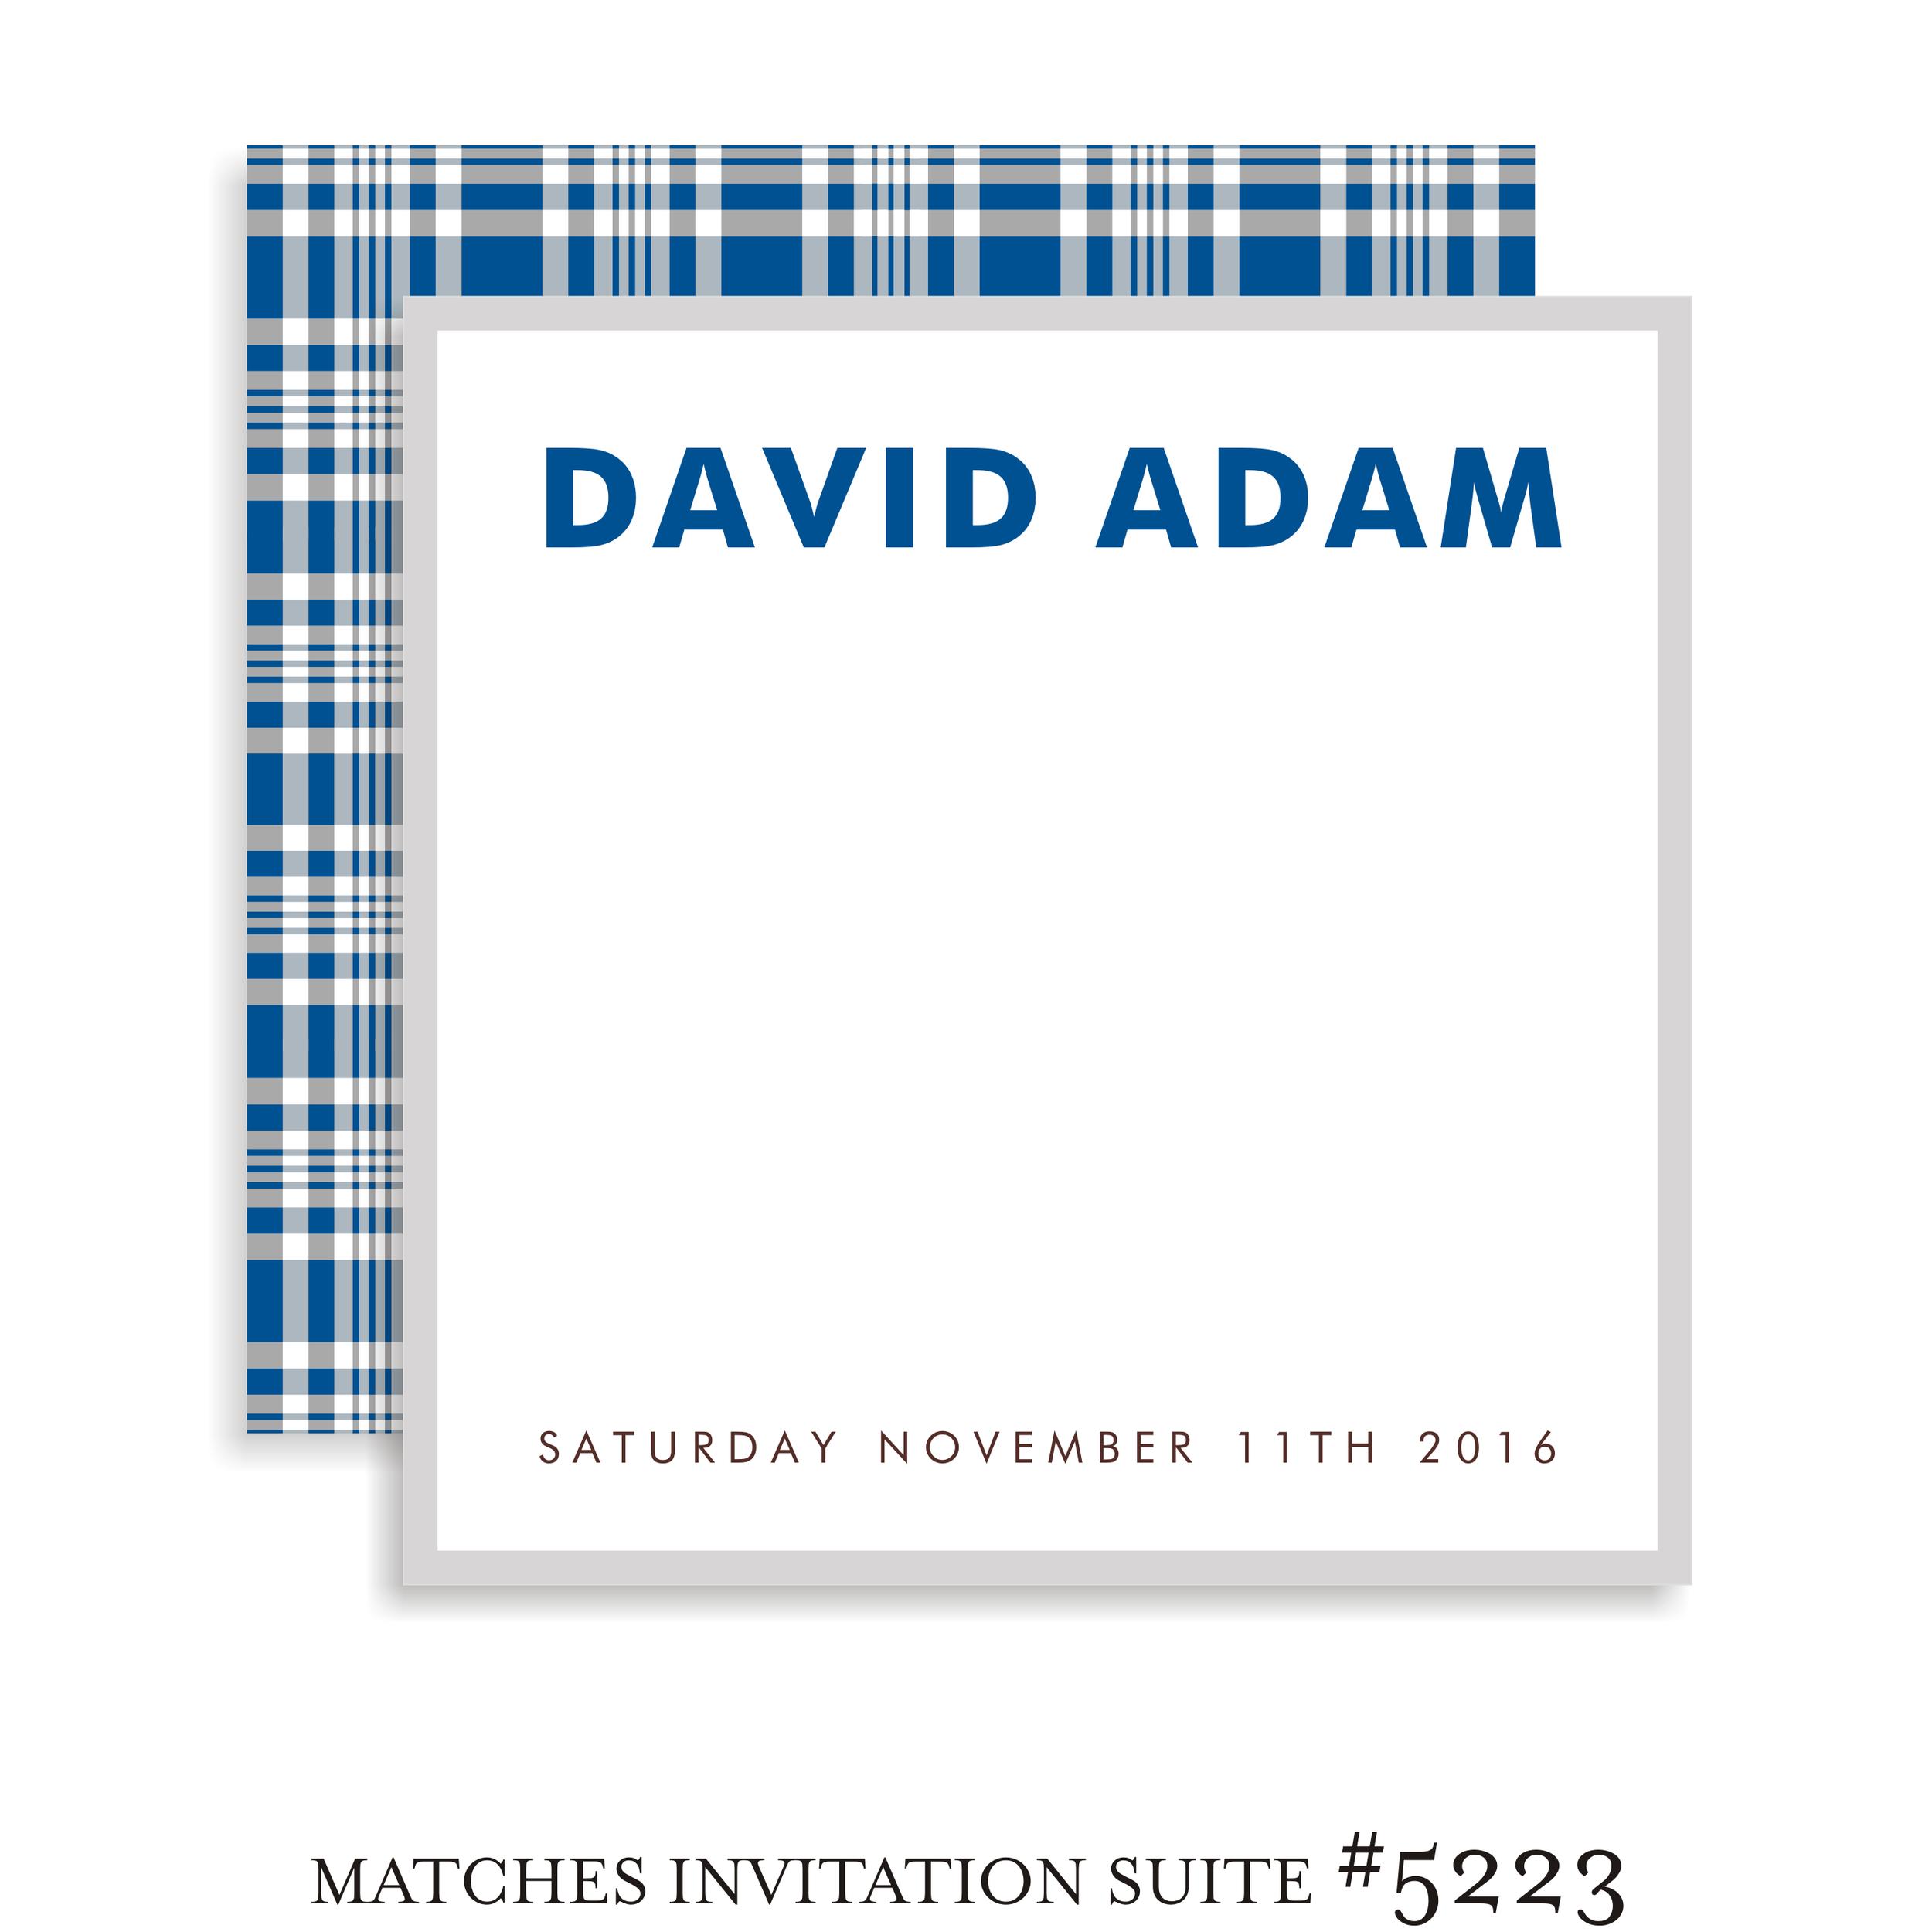 Sign In Board Bar Mitzvah Suite 5223 - David Adam